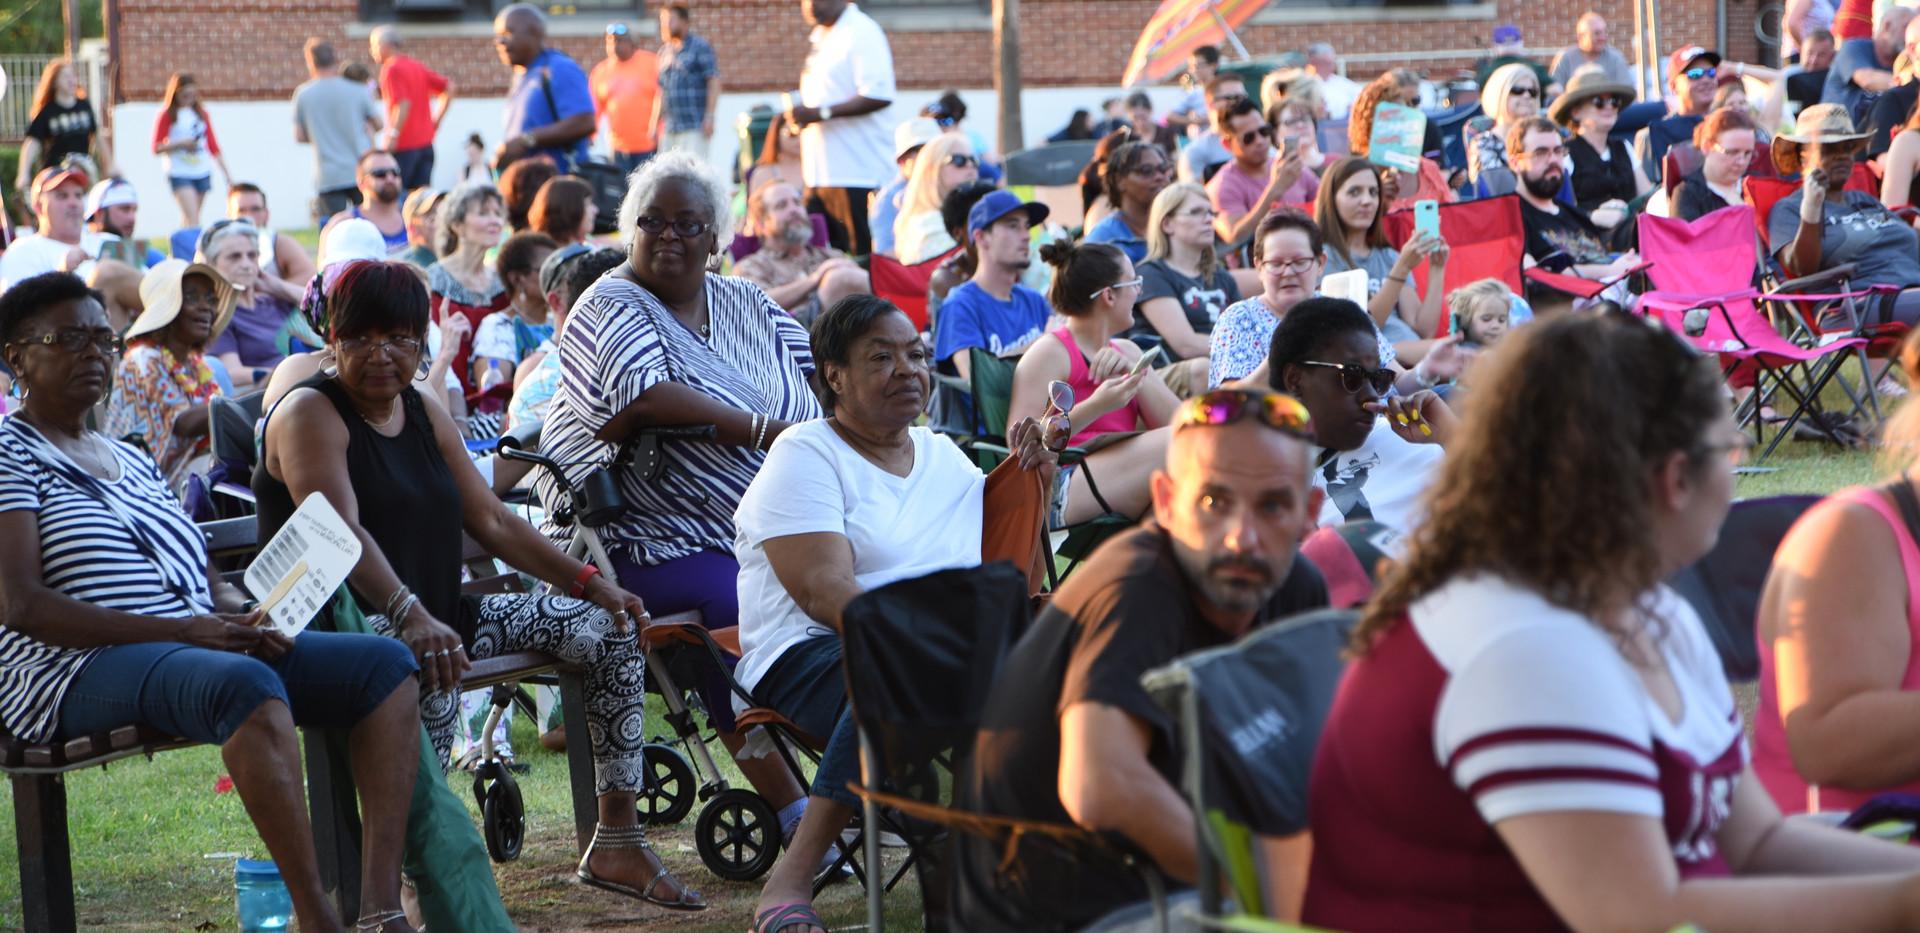 Memphis Soul crowd scene